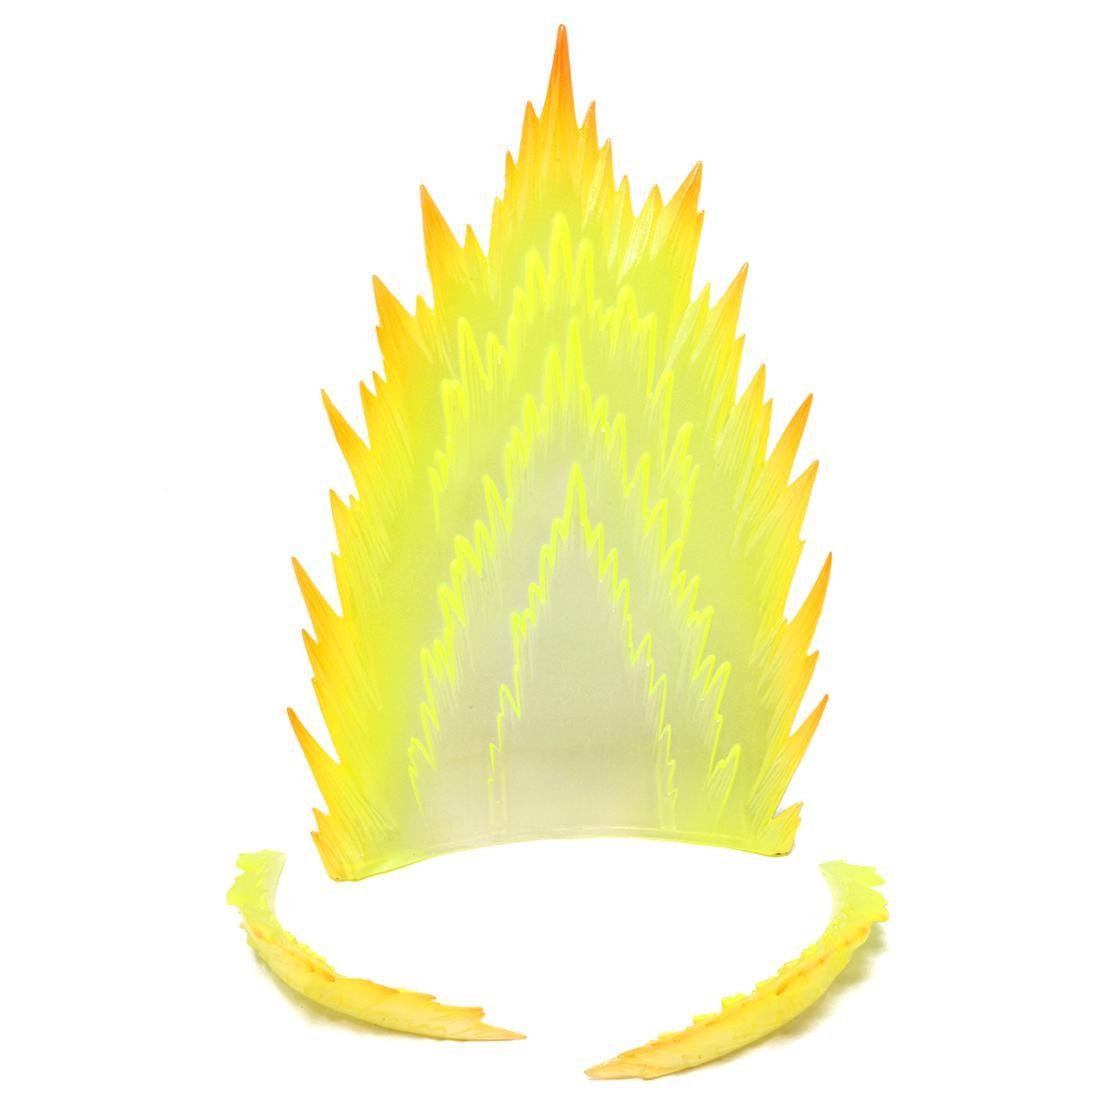 Bandai Tamashii Effect Energy Aura - Yellow version (yellow)